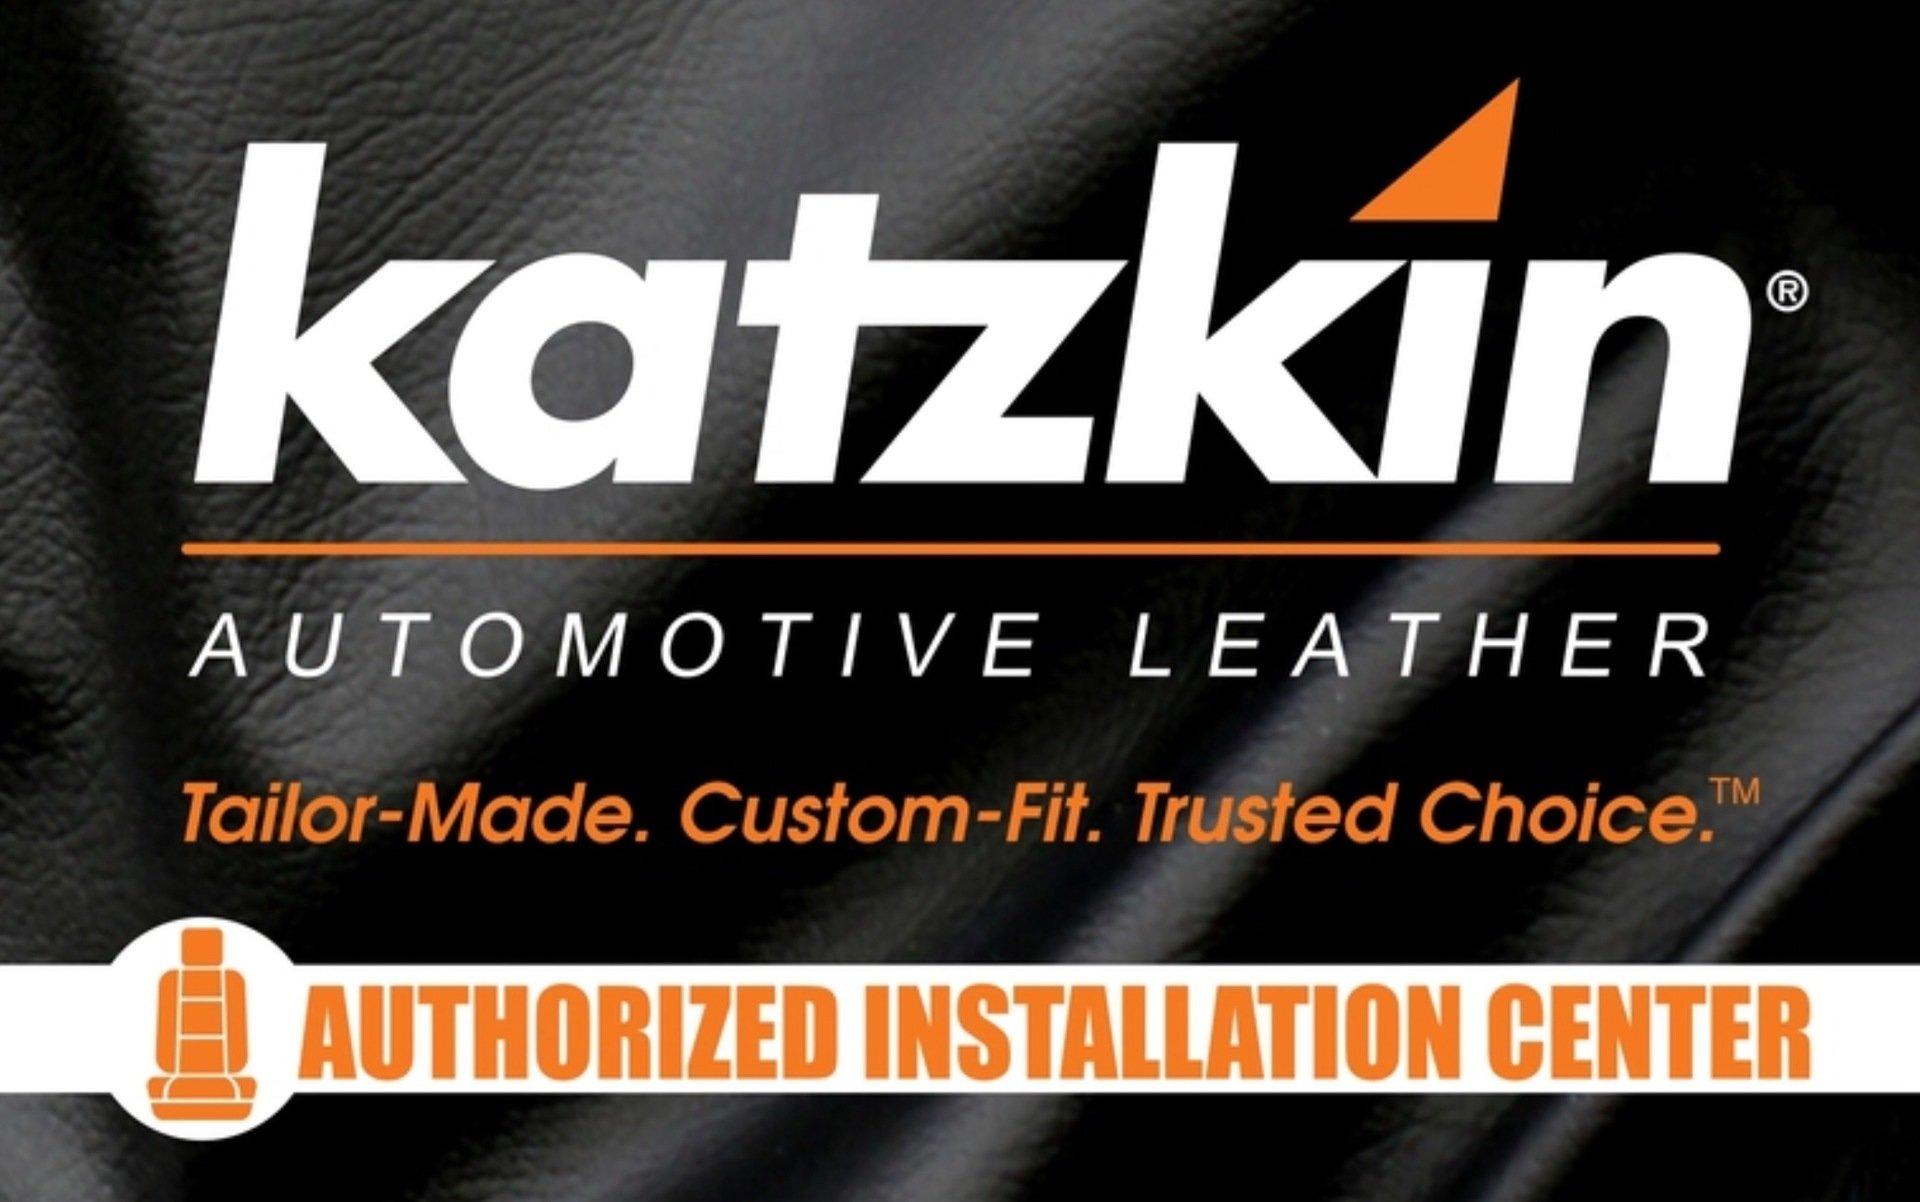 Katzkin Authorized Installation Center